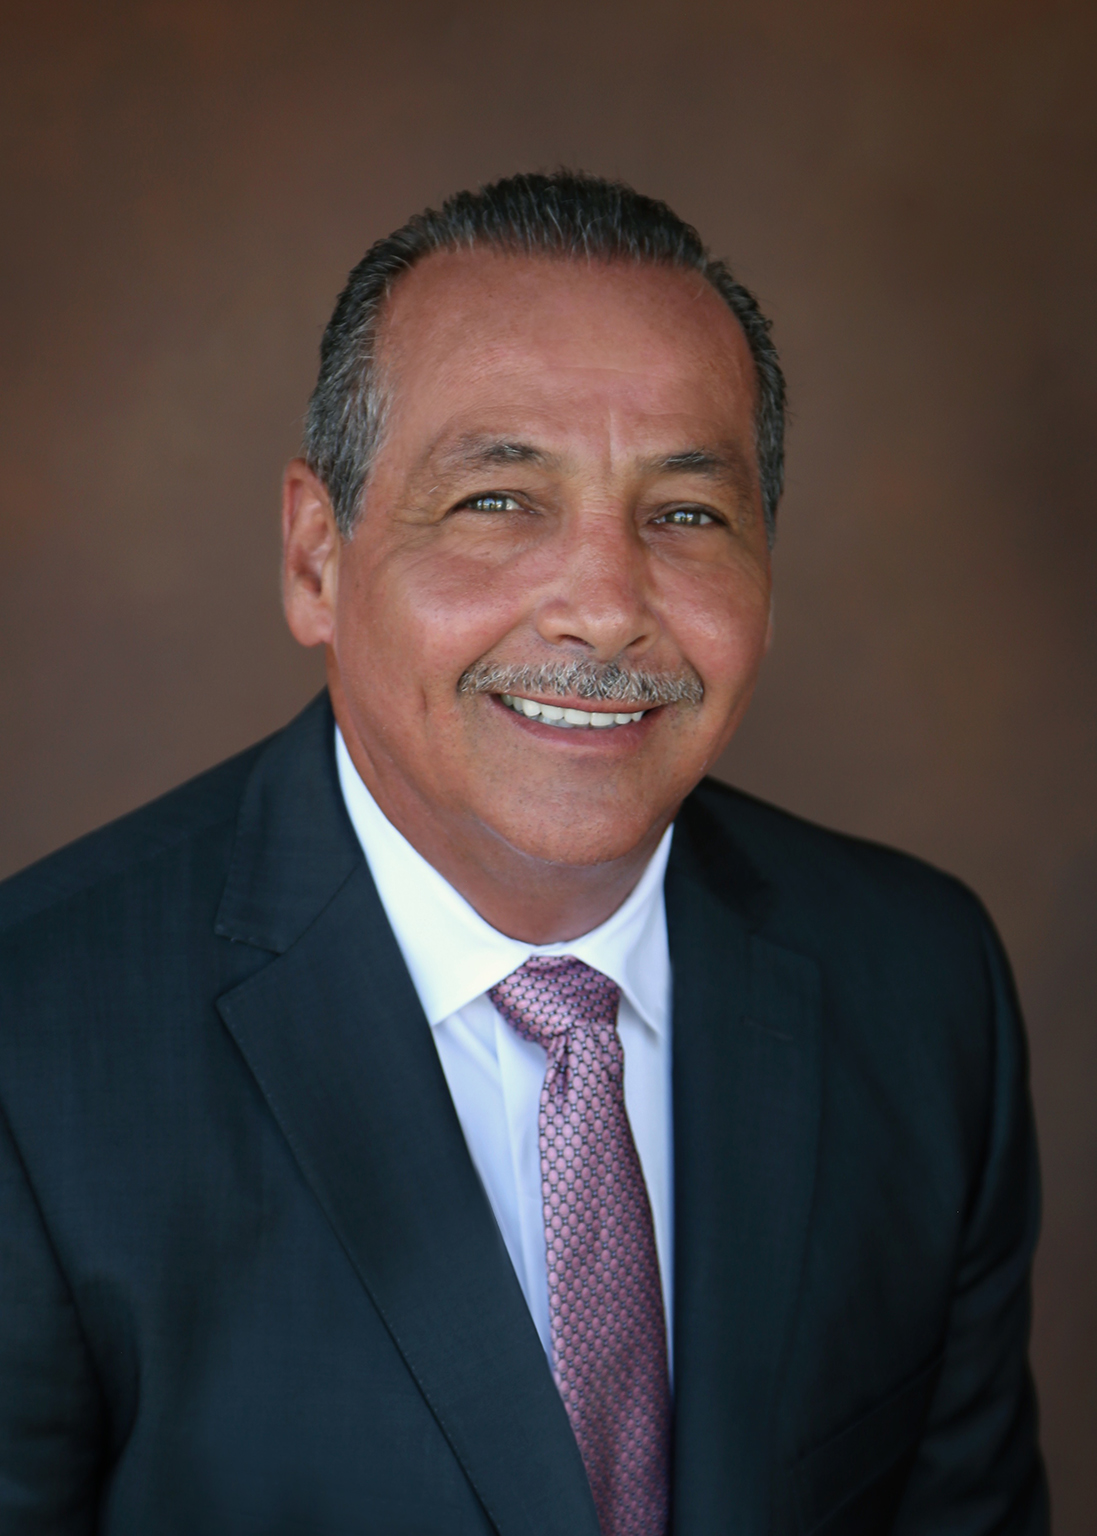 Michael Nevarez - Chairman / Founder